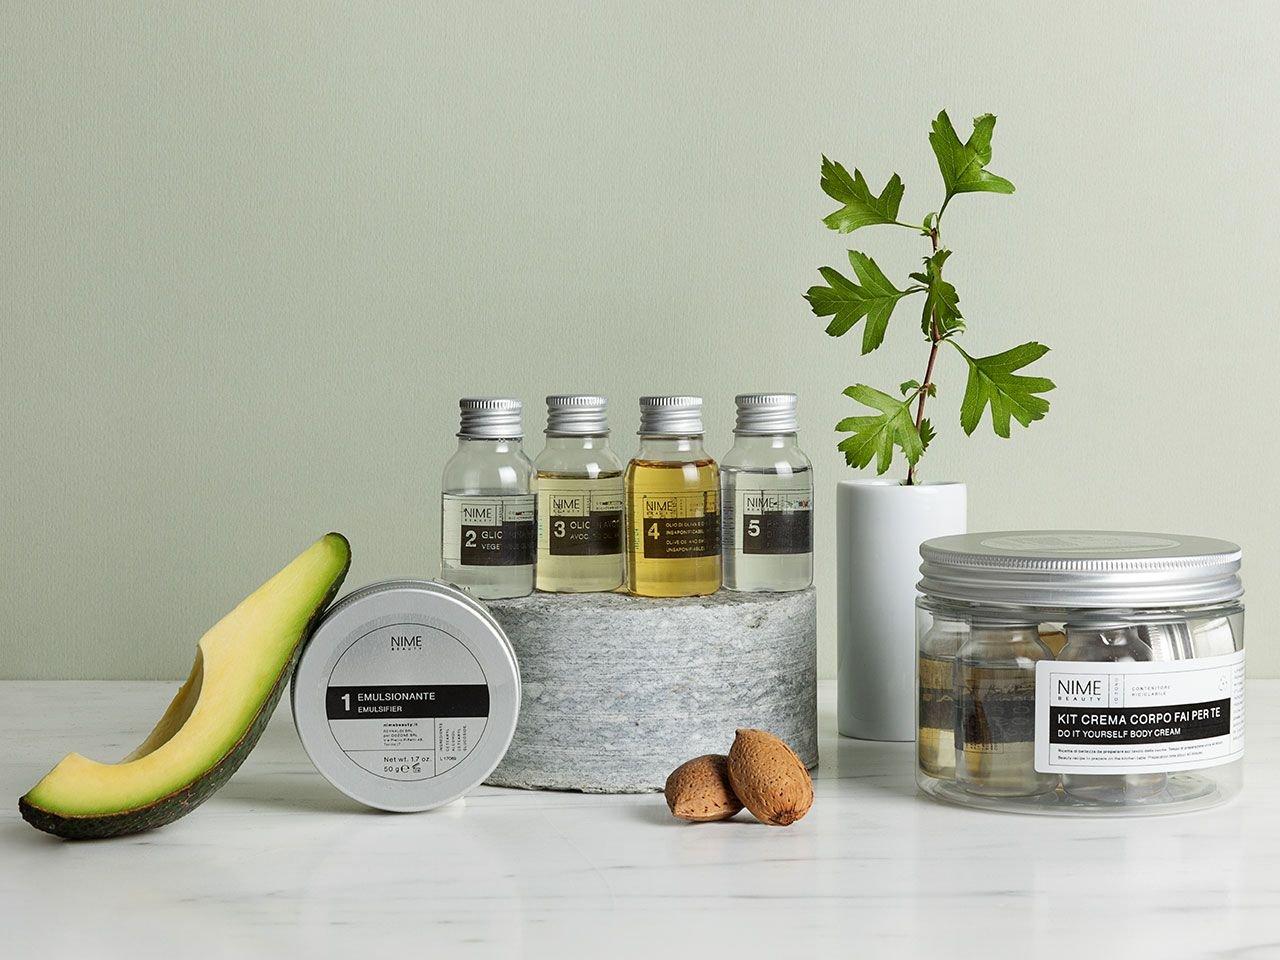 Kit Crema corpo fai per te - v1